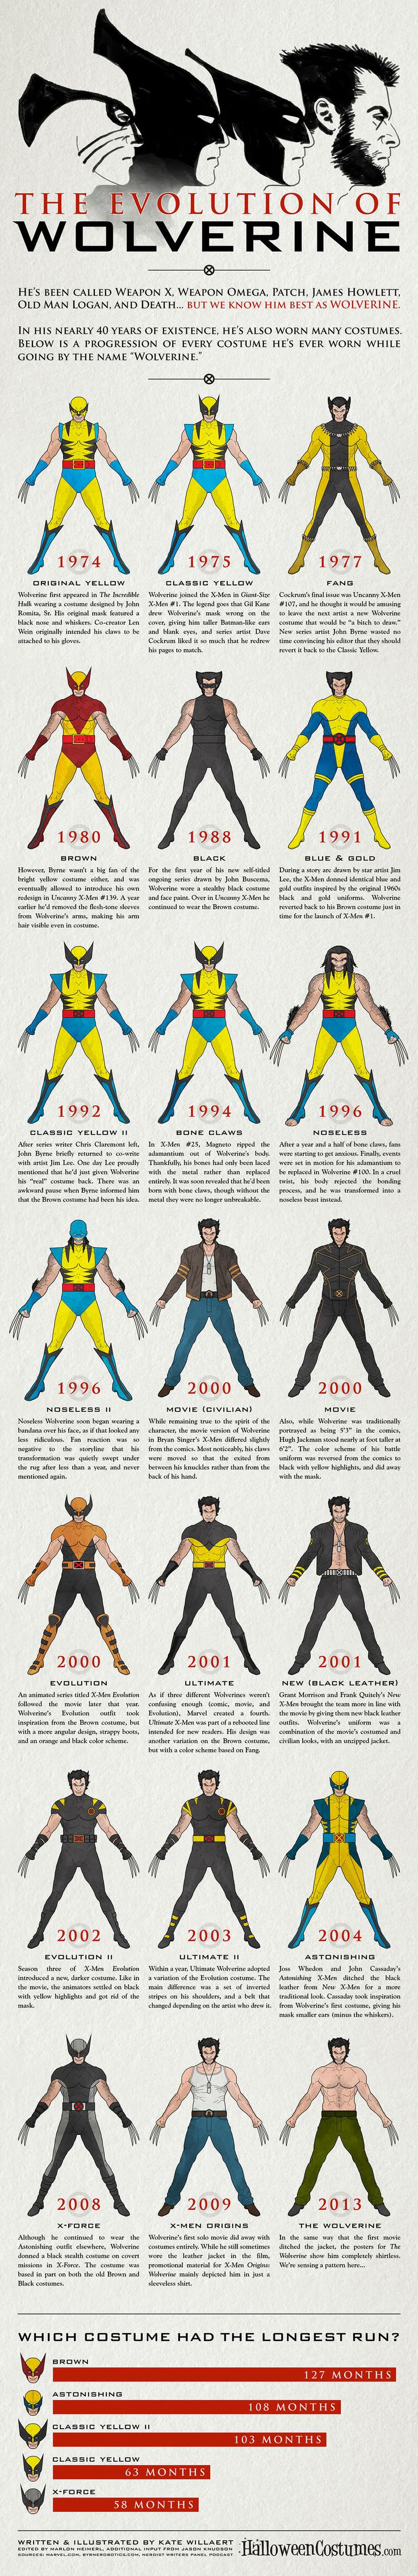 The Evolution of Wolverine | moviepilot.com #Infographic #Marvel